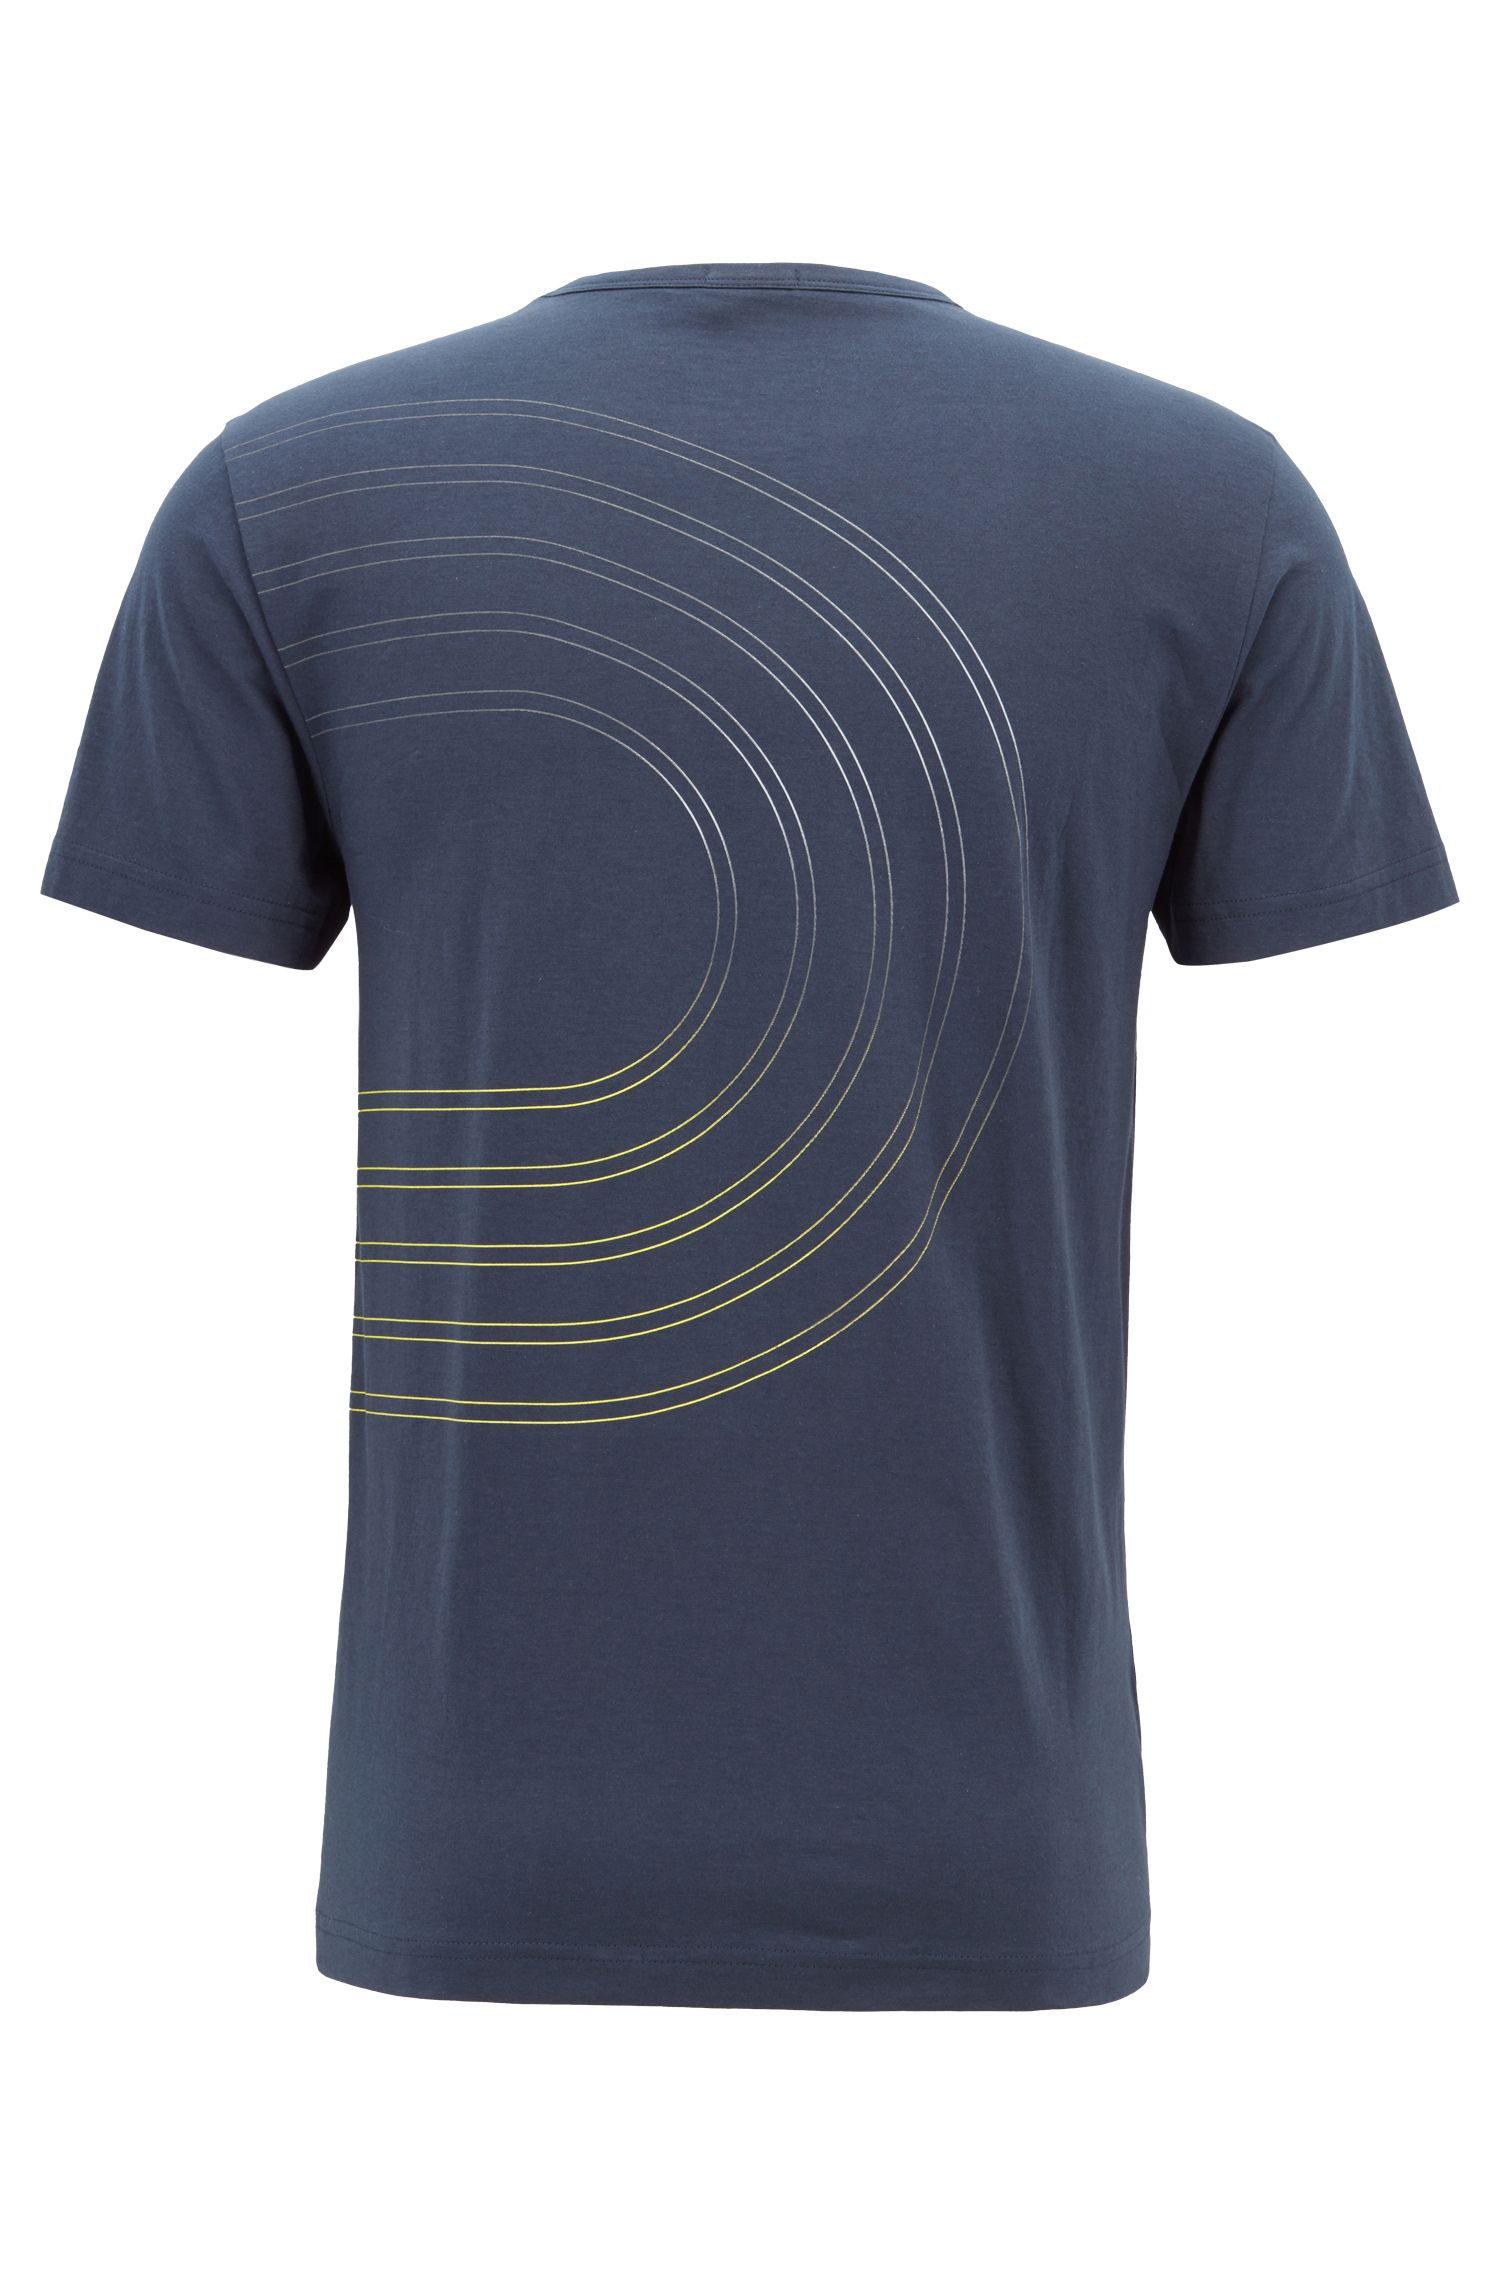 Camiseta de punto de algodón con ilustración de logo en colores, Azul oscuro